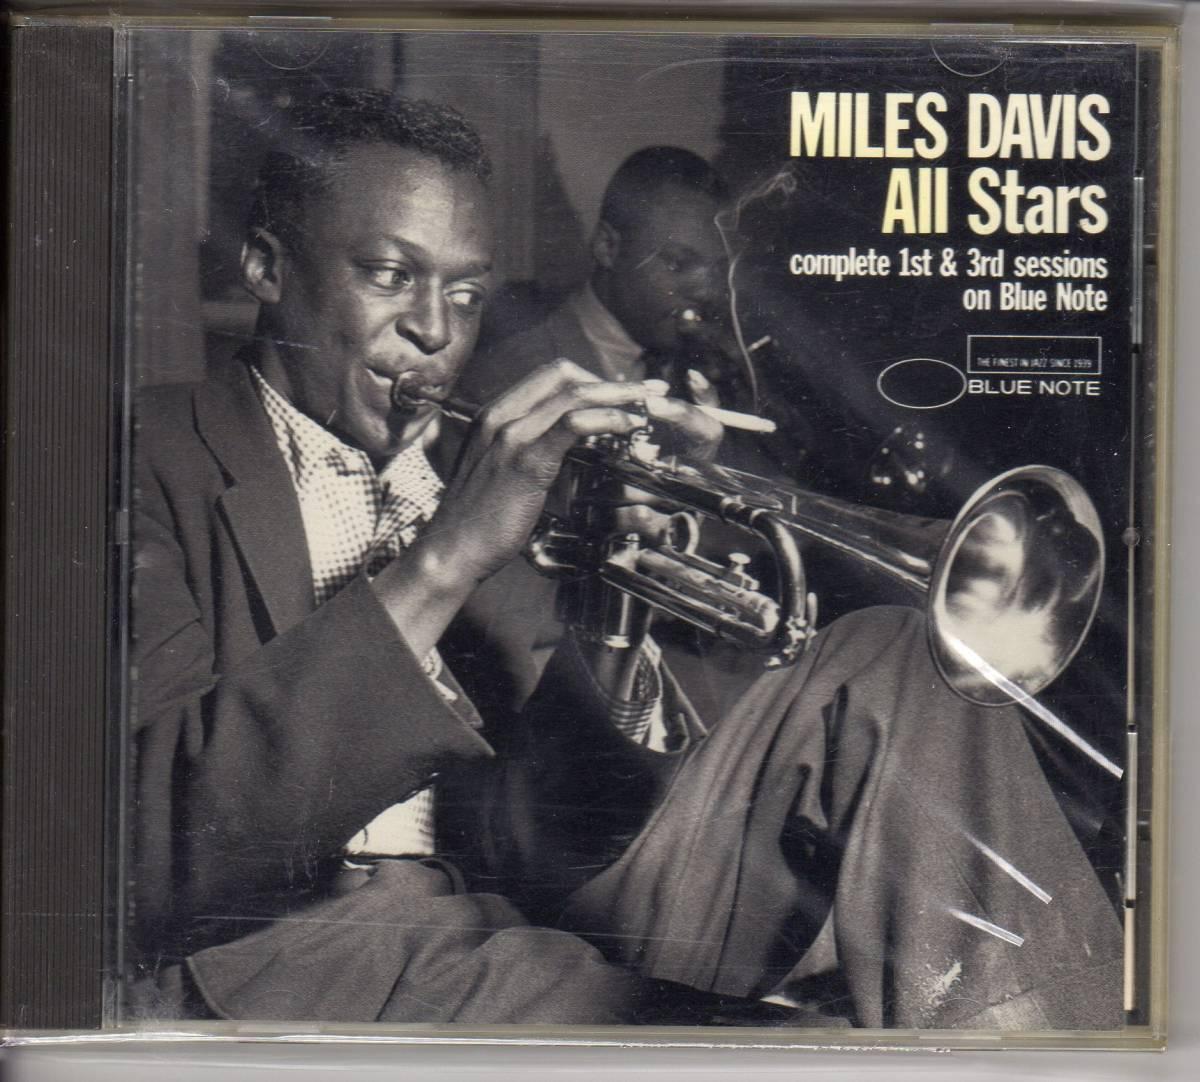 2064【CD】Miles Davis All Stars/マイルス・デイヴィス◆COMPLETE 1ST & 3RD SESSIONS ON BLUE NOTE◆CJ28-5056◆国内盤◆1954年録音◆_画像1